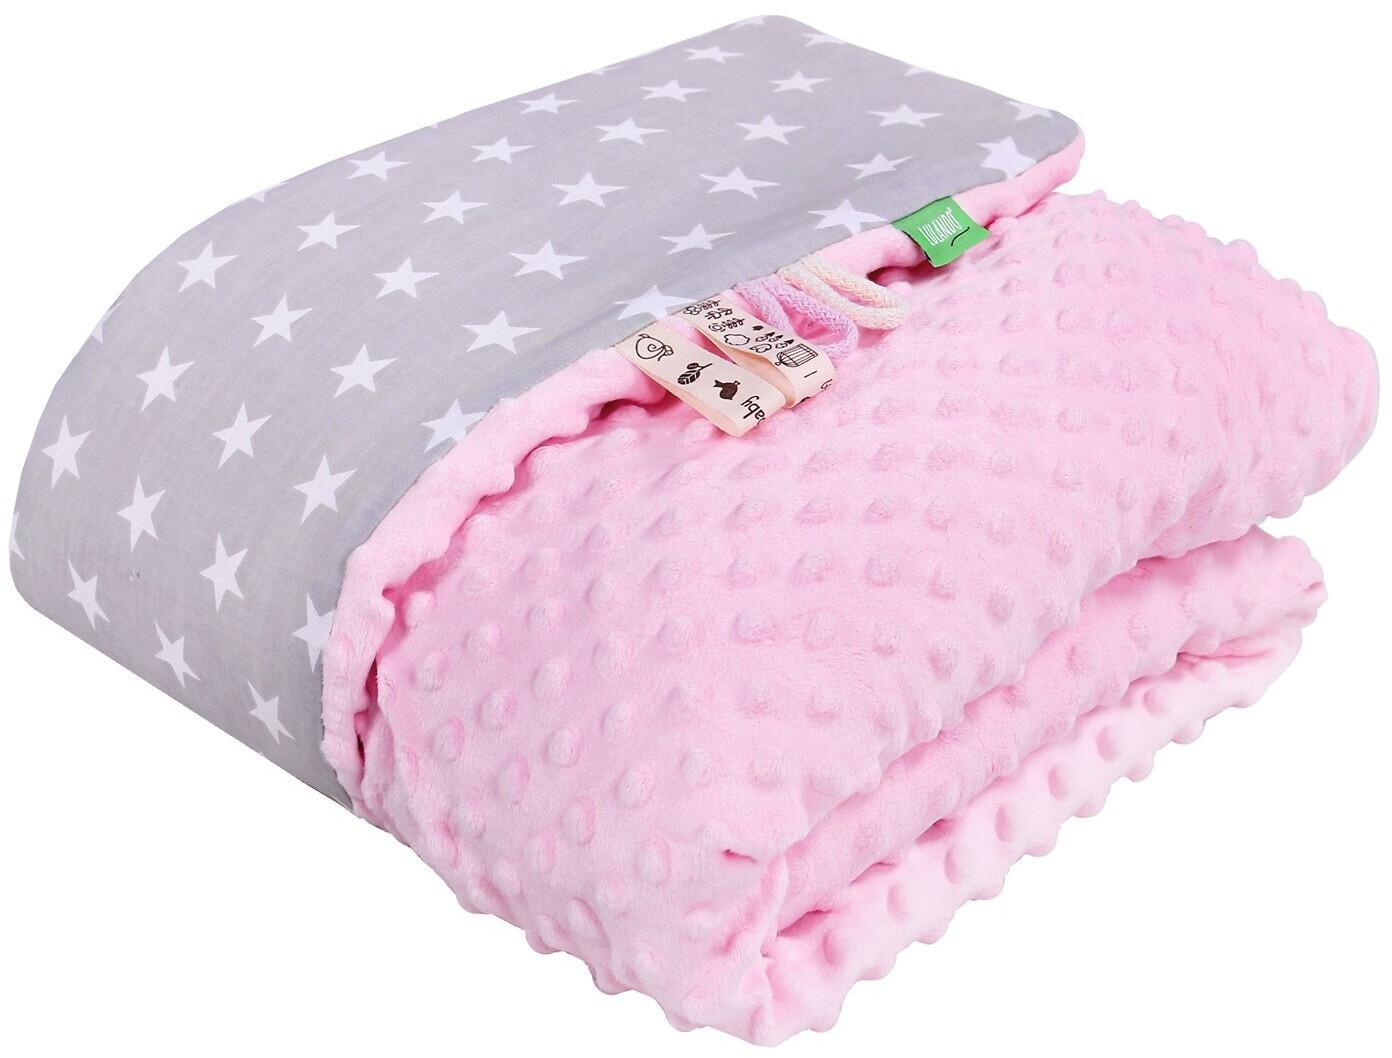 Lulando Babydecke Minky pink/graue sterne